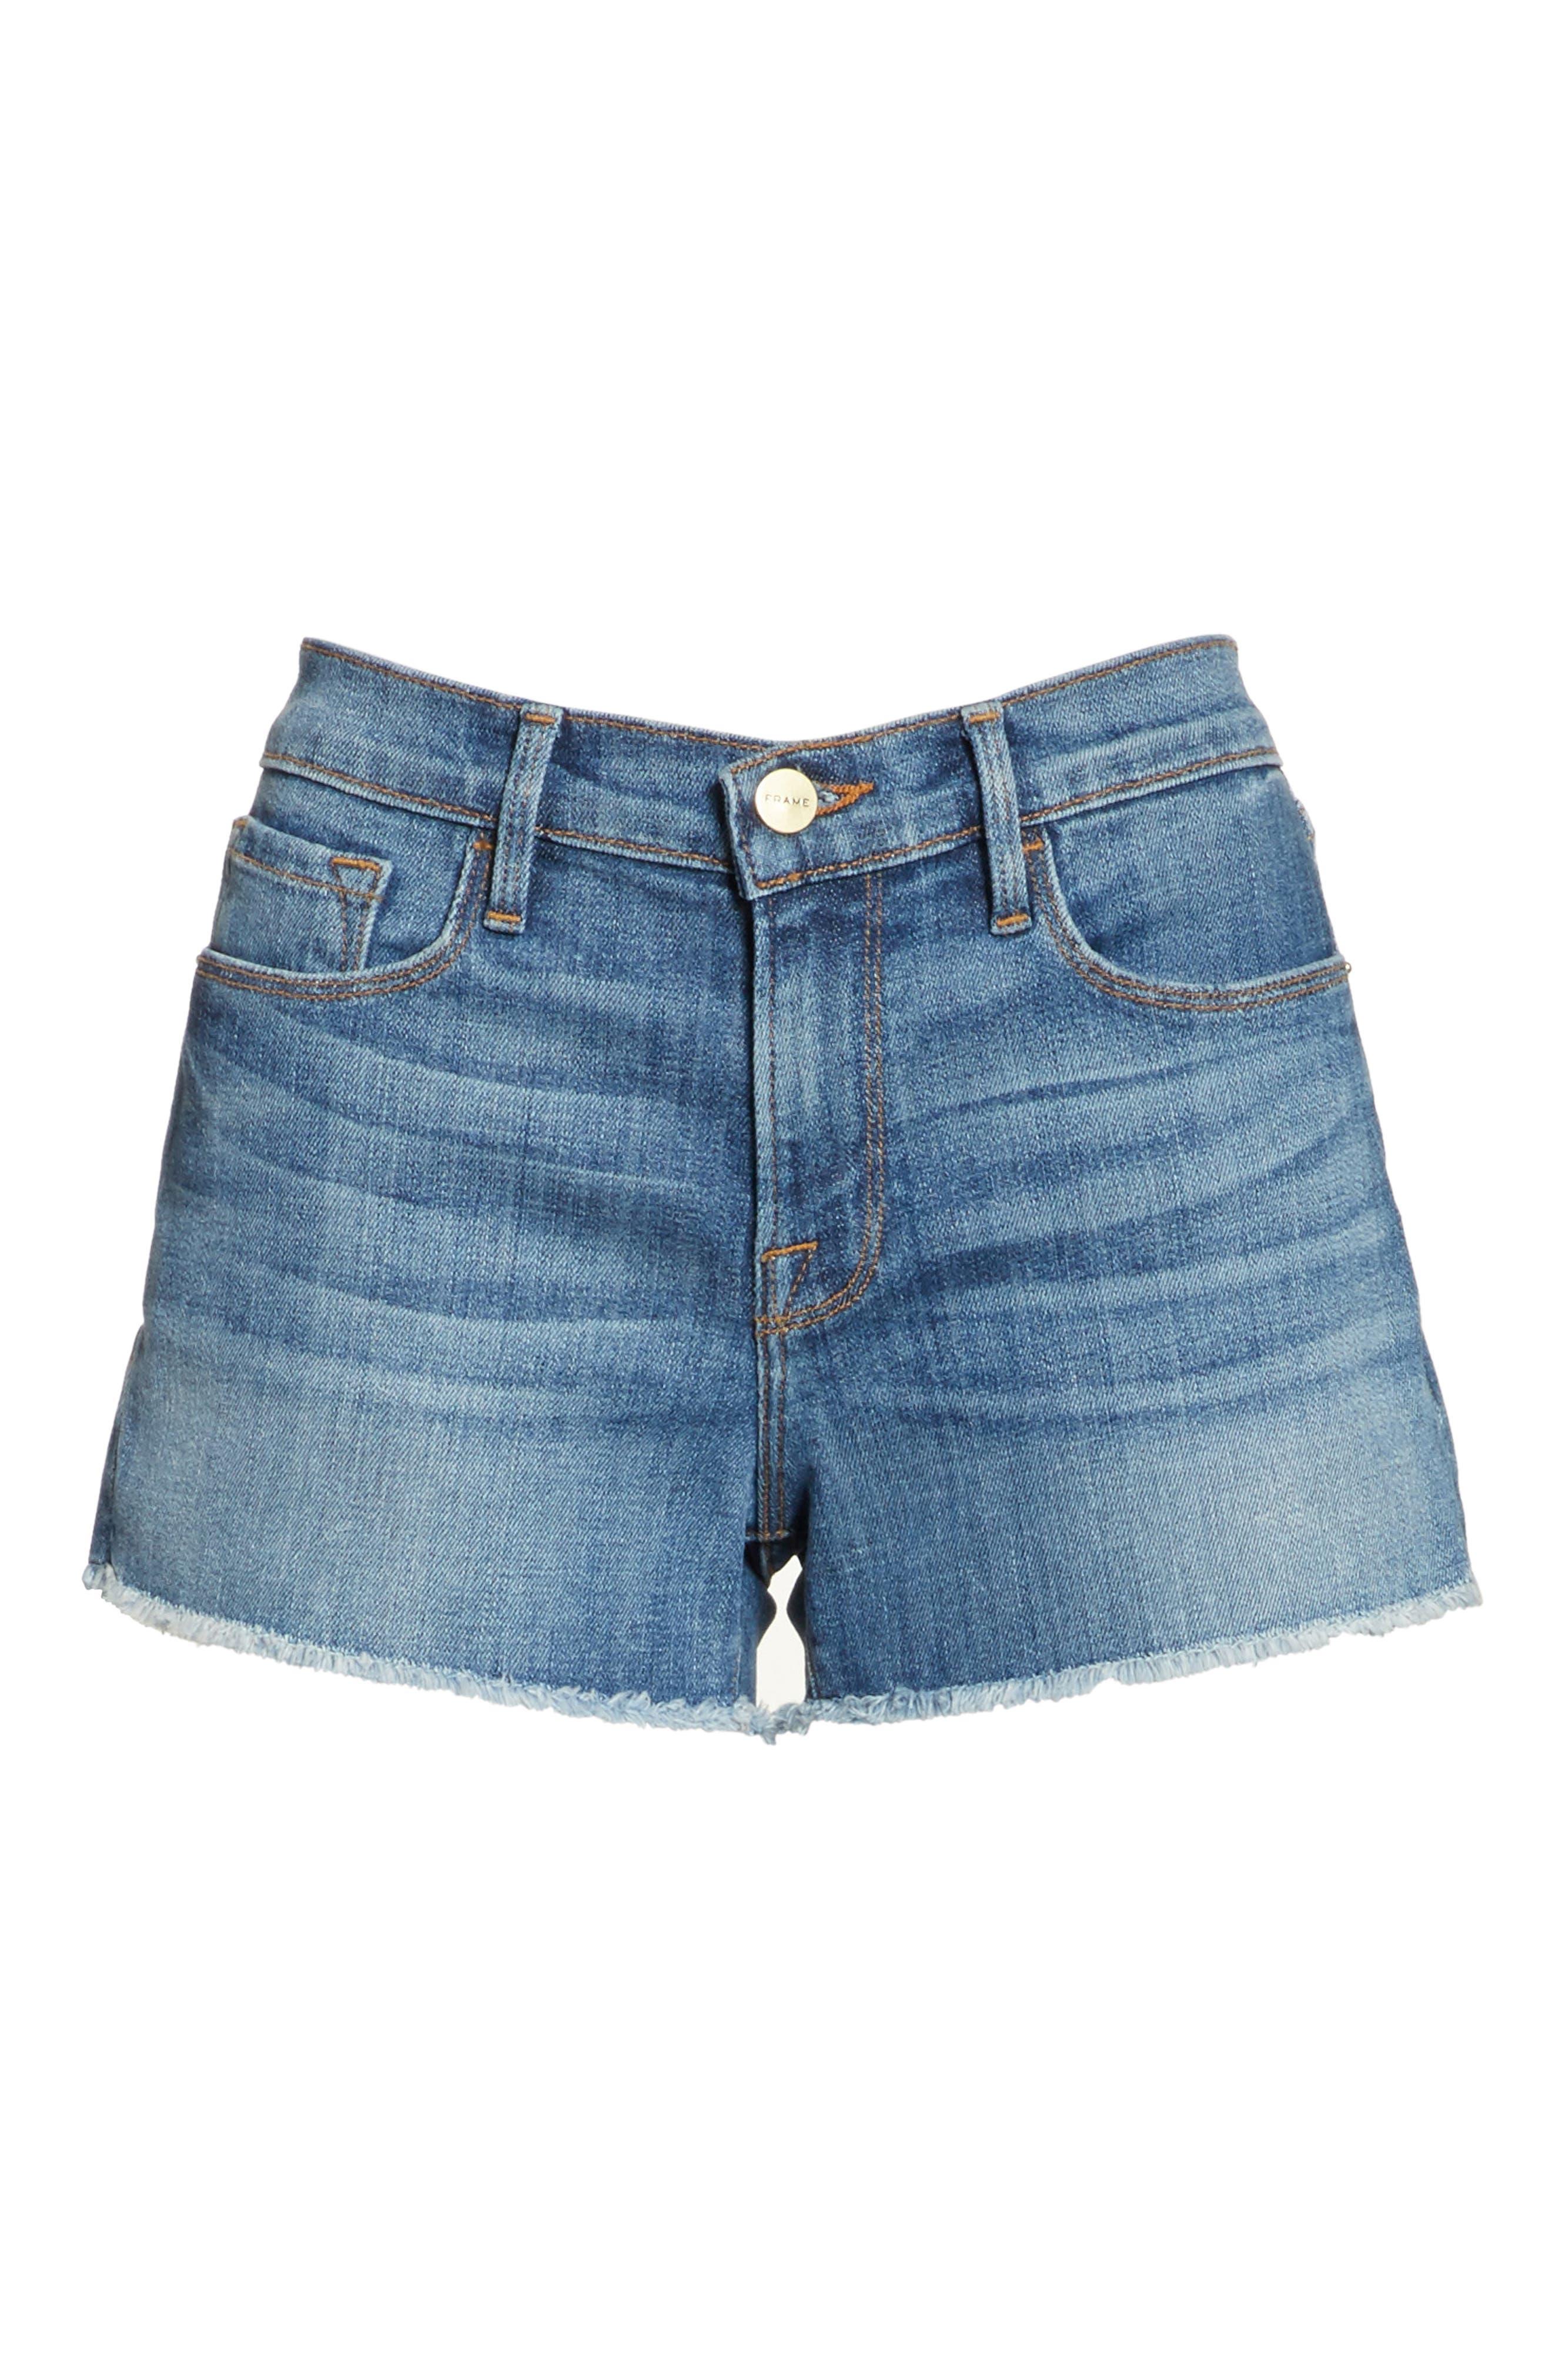 Le Cutoff Denim Shorts,                             Alternate thumbnail 6, color,                             Aldred